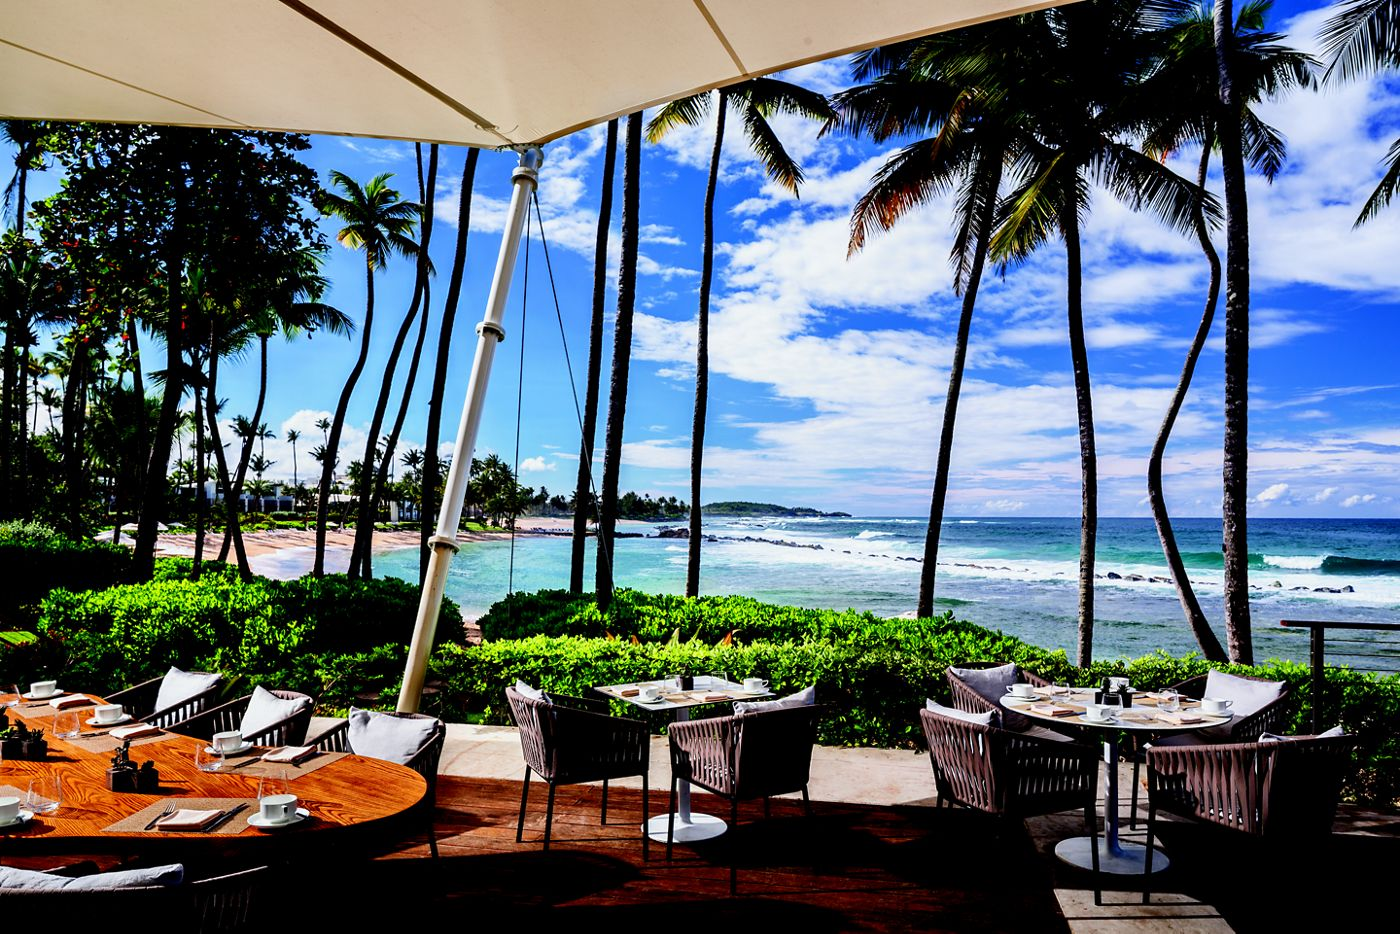 Dorado Beach Announces Third Annual Culinary Getaway November 9 12 Linda Lang 39 S Taste Of Travel